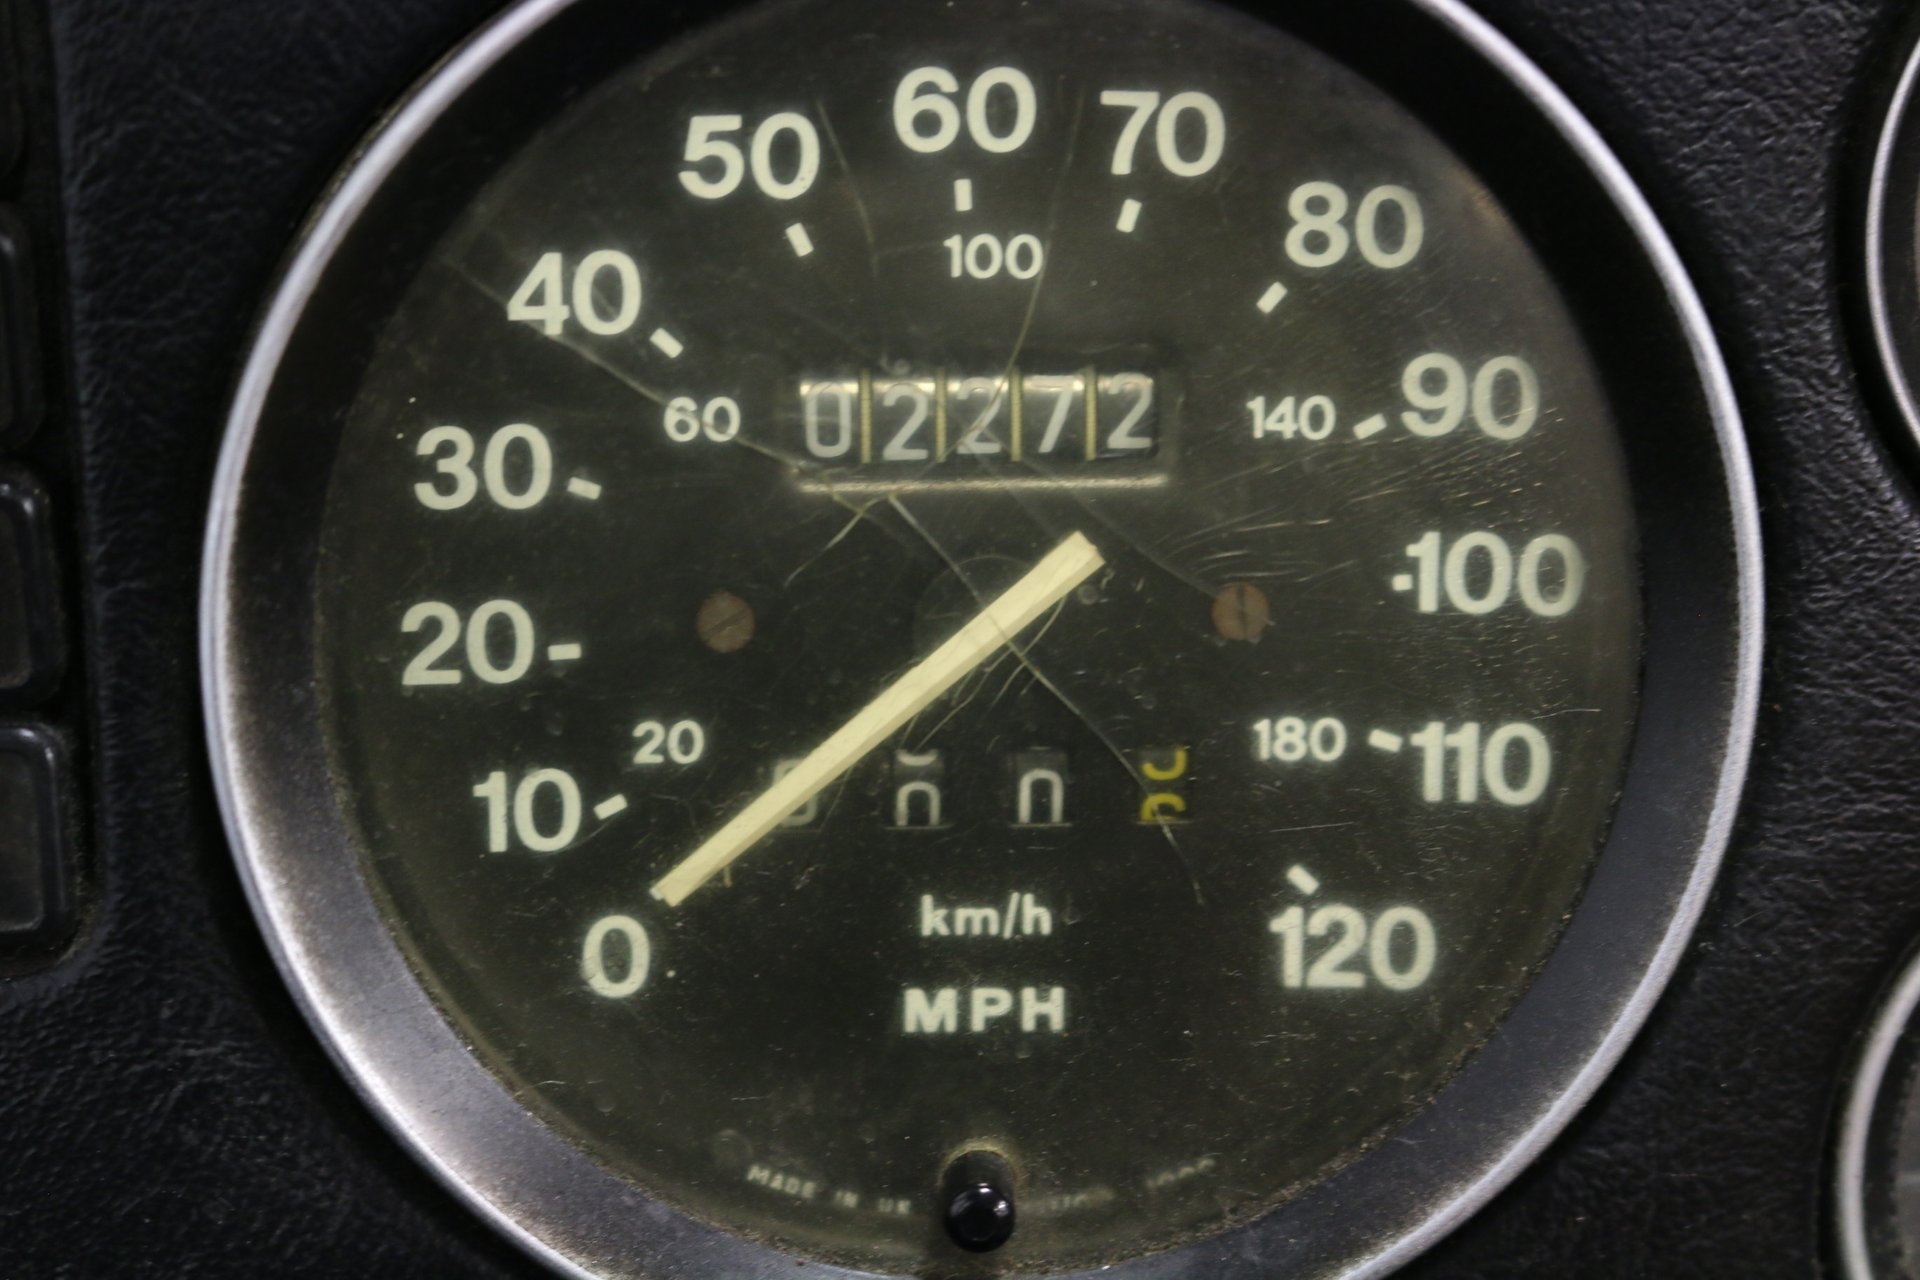 1979 MG MGB | Streetside Classics - The Nation's Trusted Classic Car